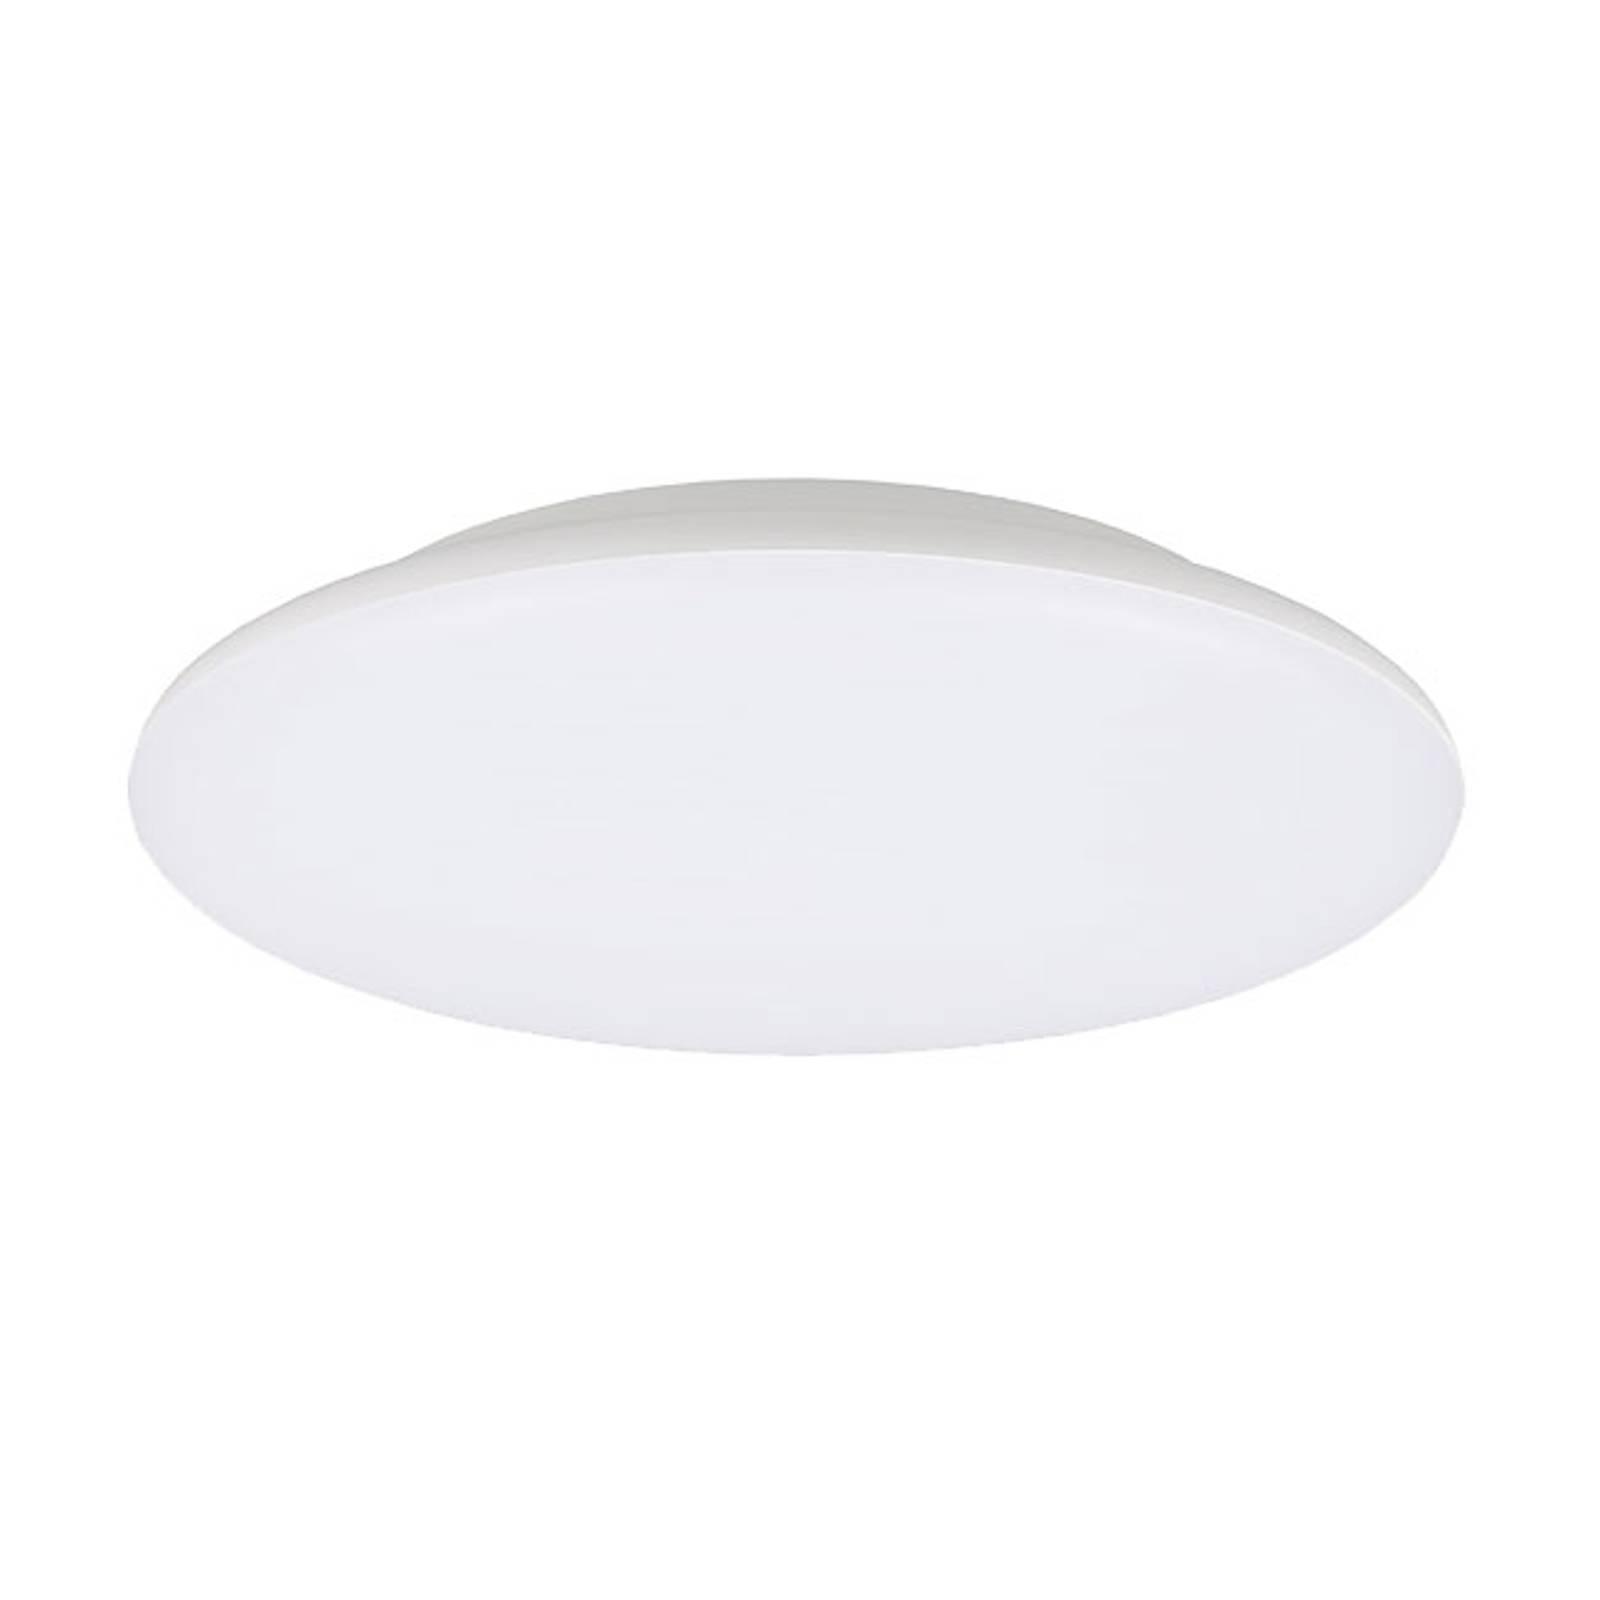 Arcchio Samory LED-Deckenleuchte, Ø 40 cm